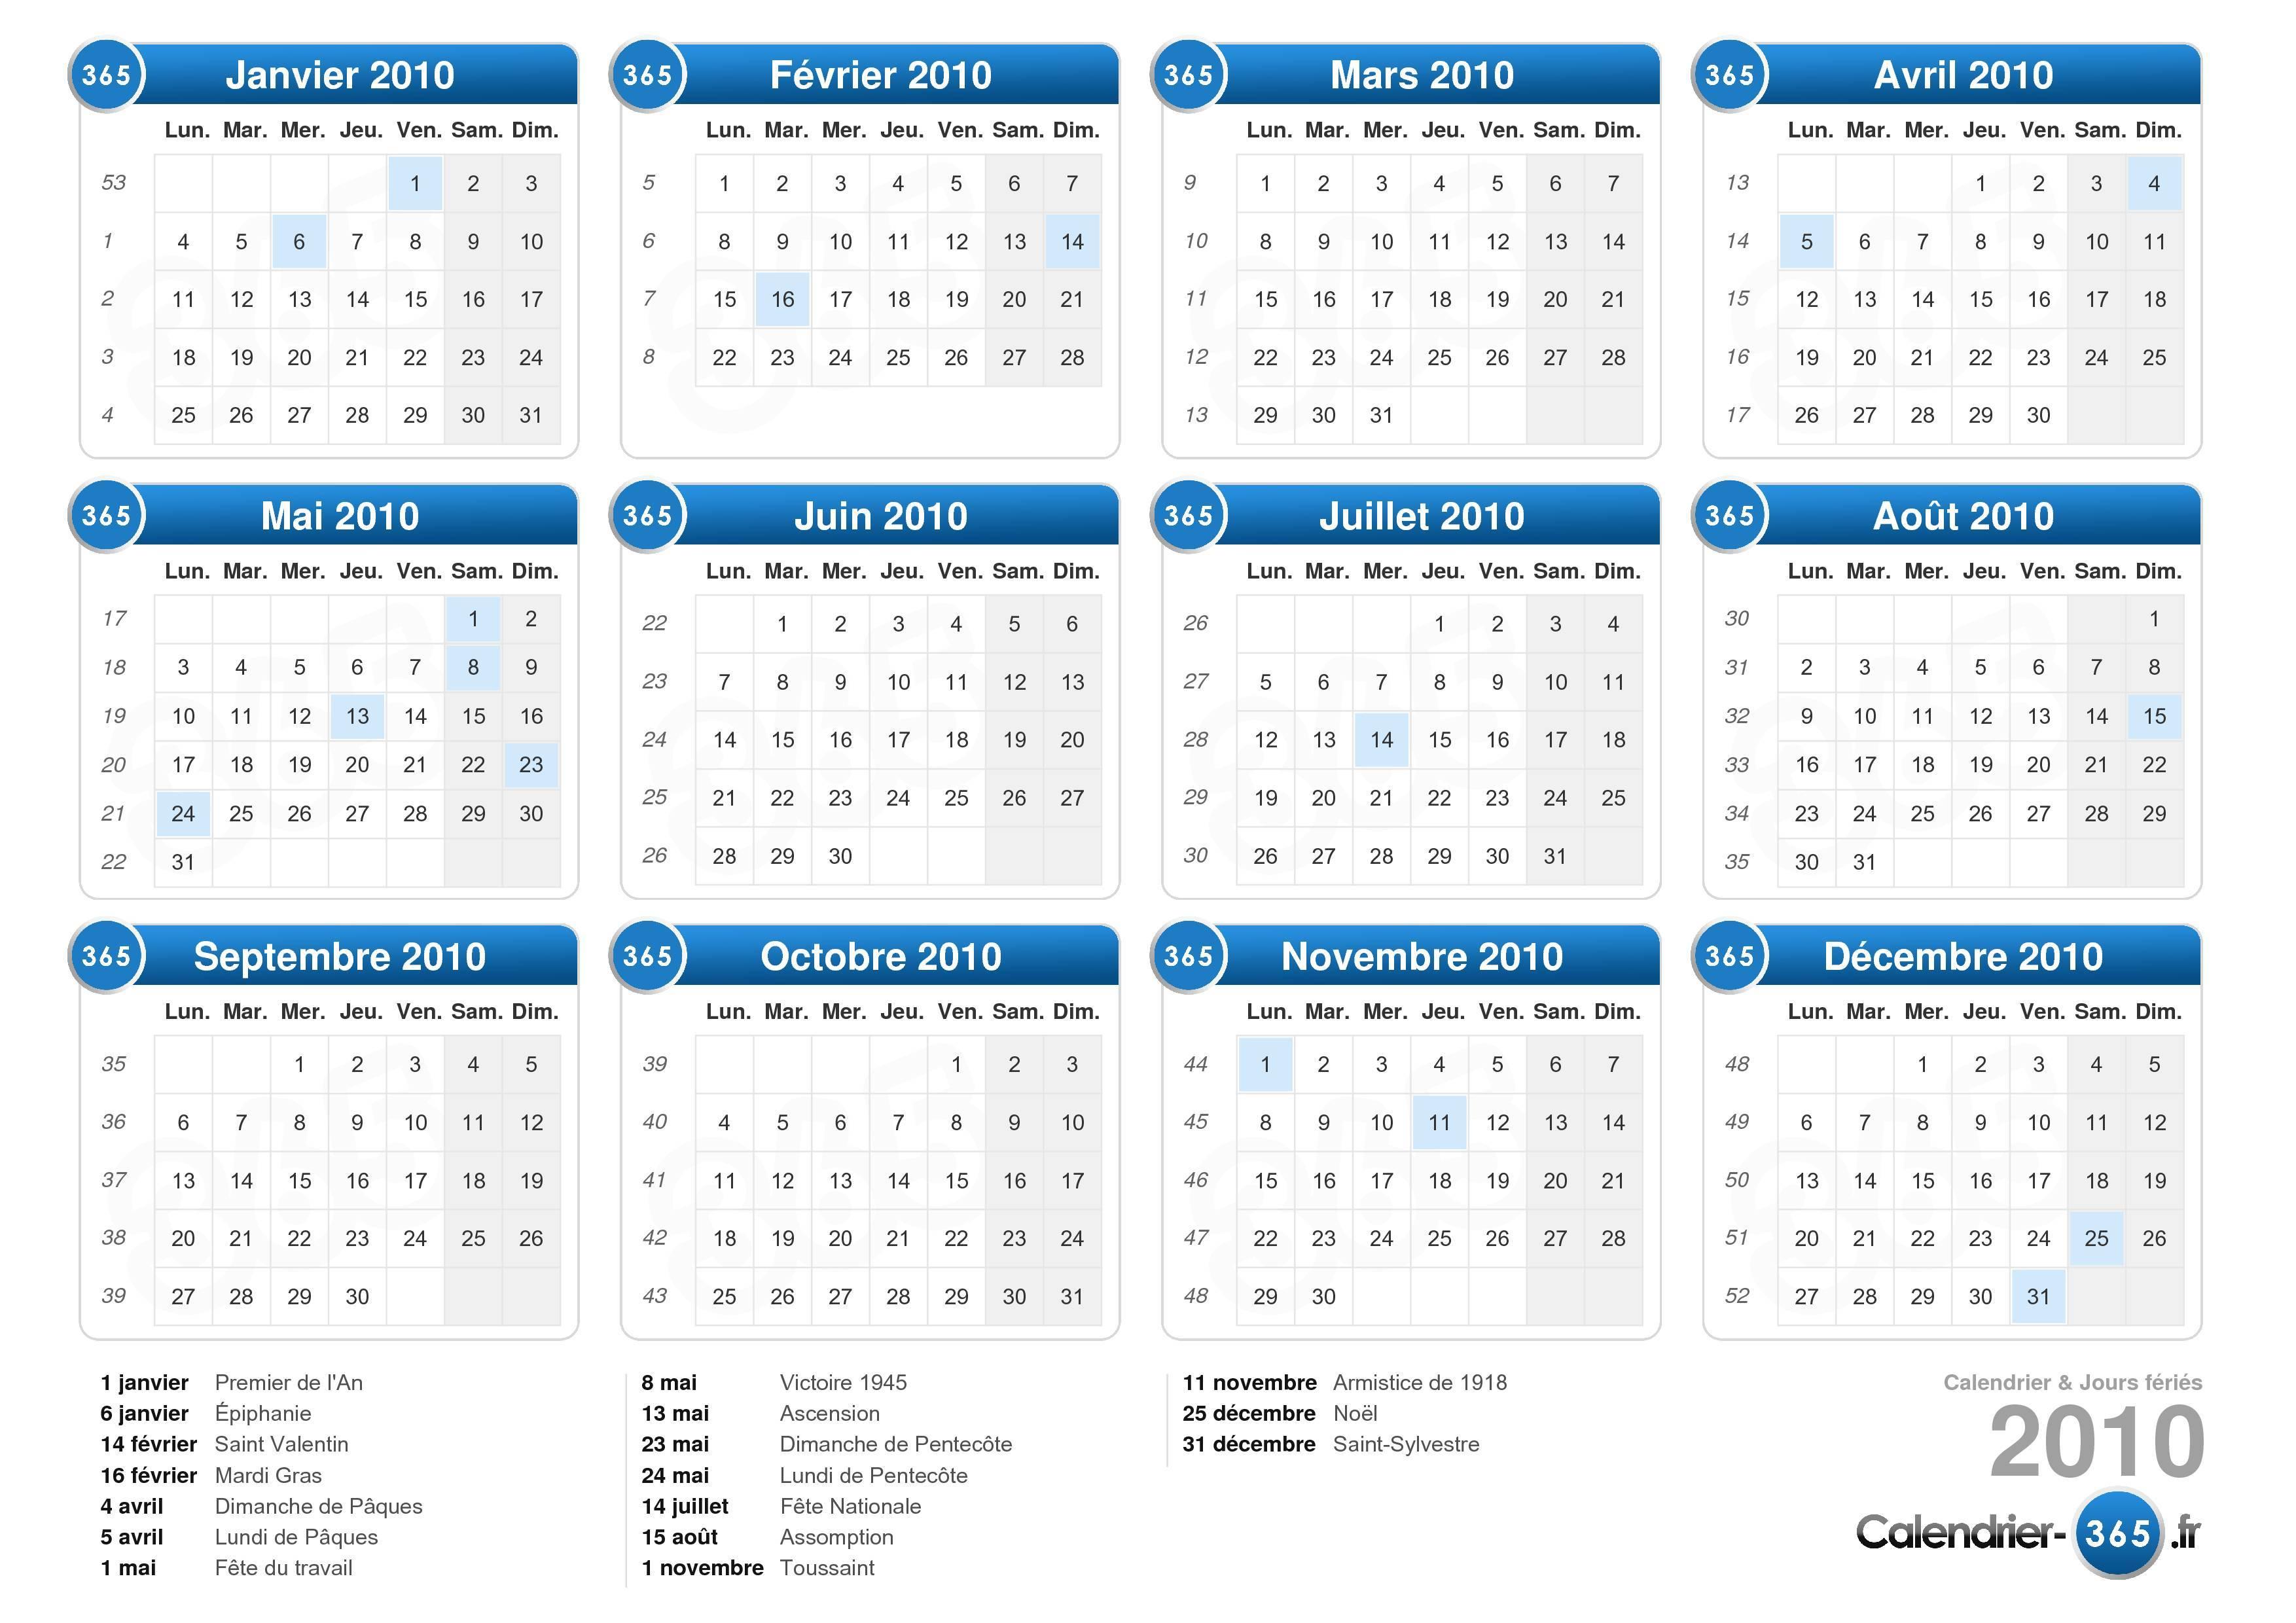 Calendrier 2010 - Calendrier lune septembre 2017 ...